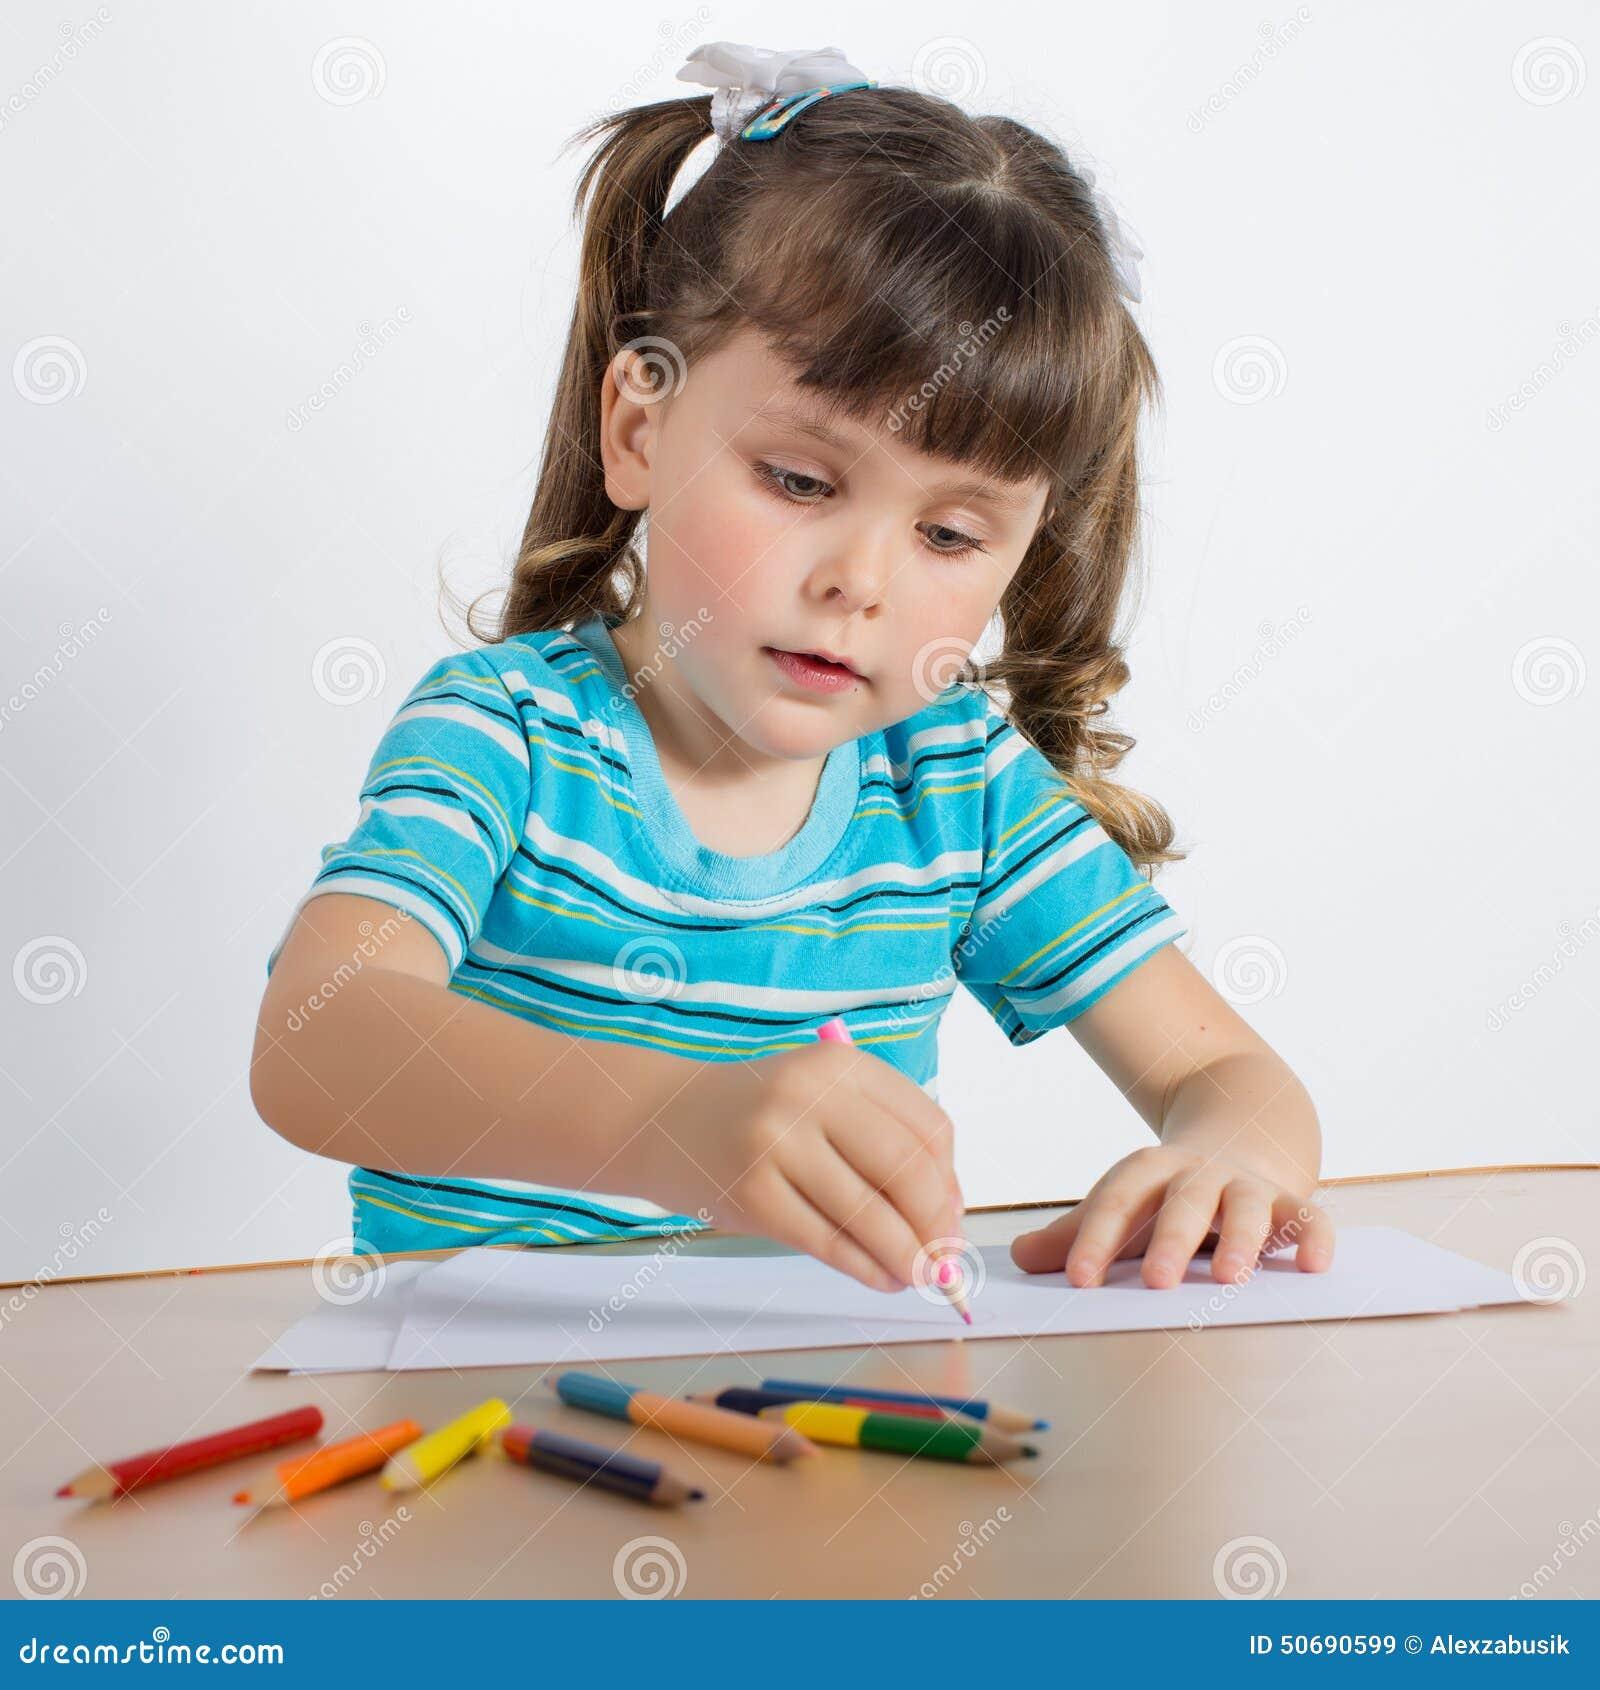 Download 少许画女孩 库存图片. 图片 包括有 子项, 无罪, 休闲, 铅笔, 蓝色, 蜡笔, 女儿, 白种人, 国内 - 50690599